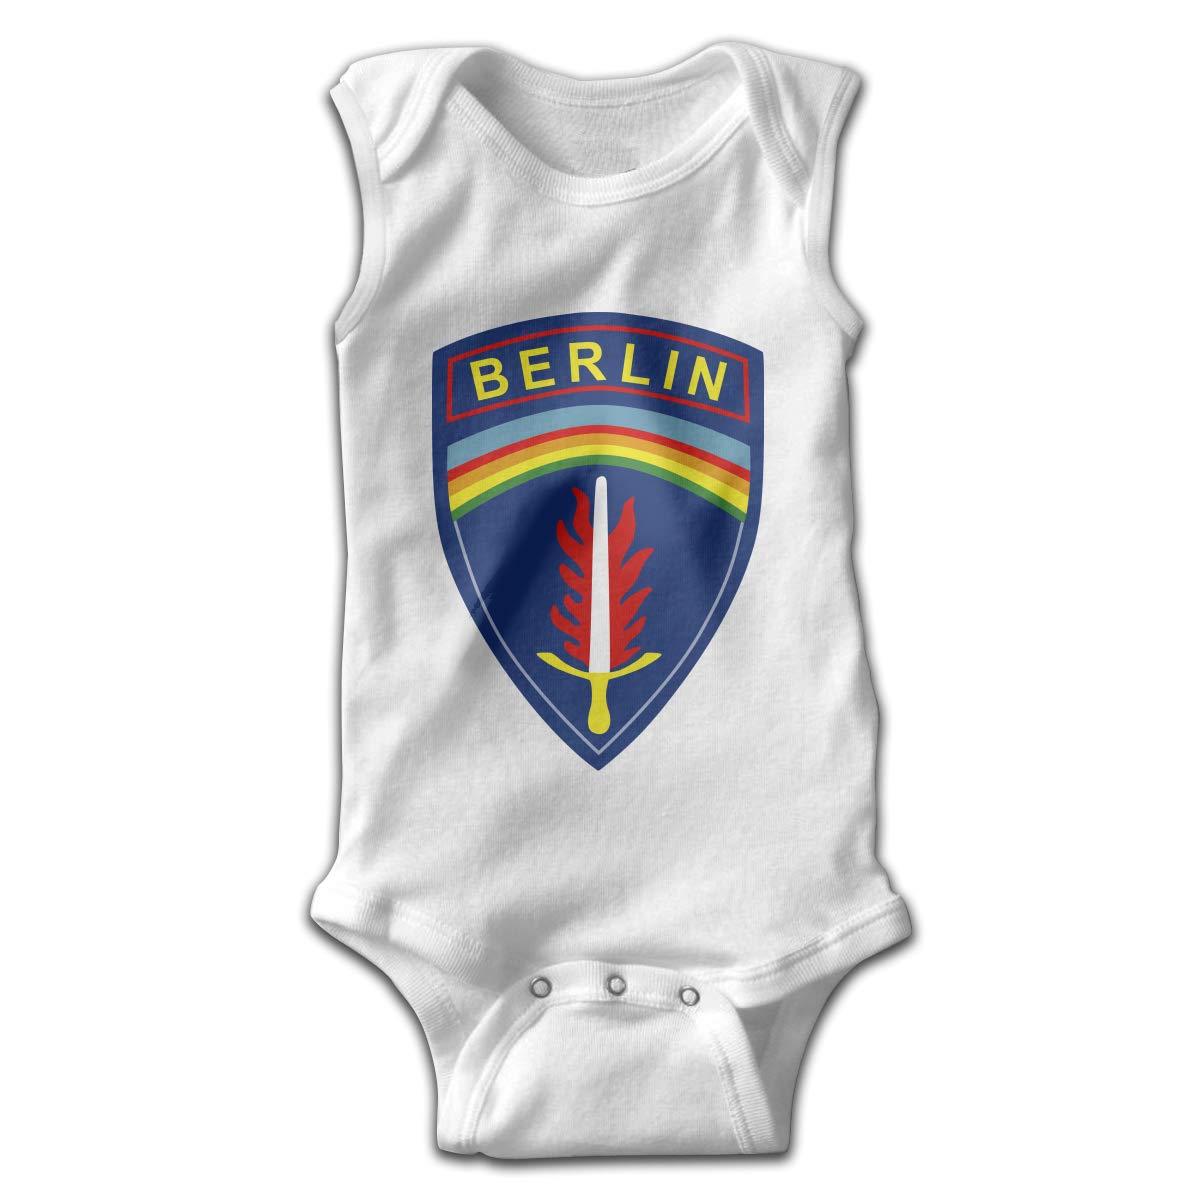 United States Army Berlin Logo Smalls Baby Onesie,Infant Bodysuit Black